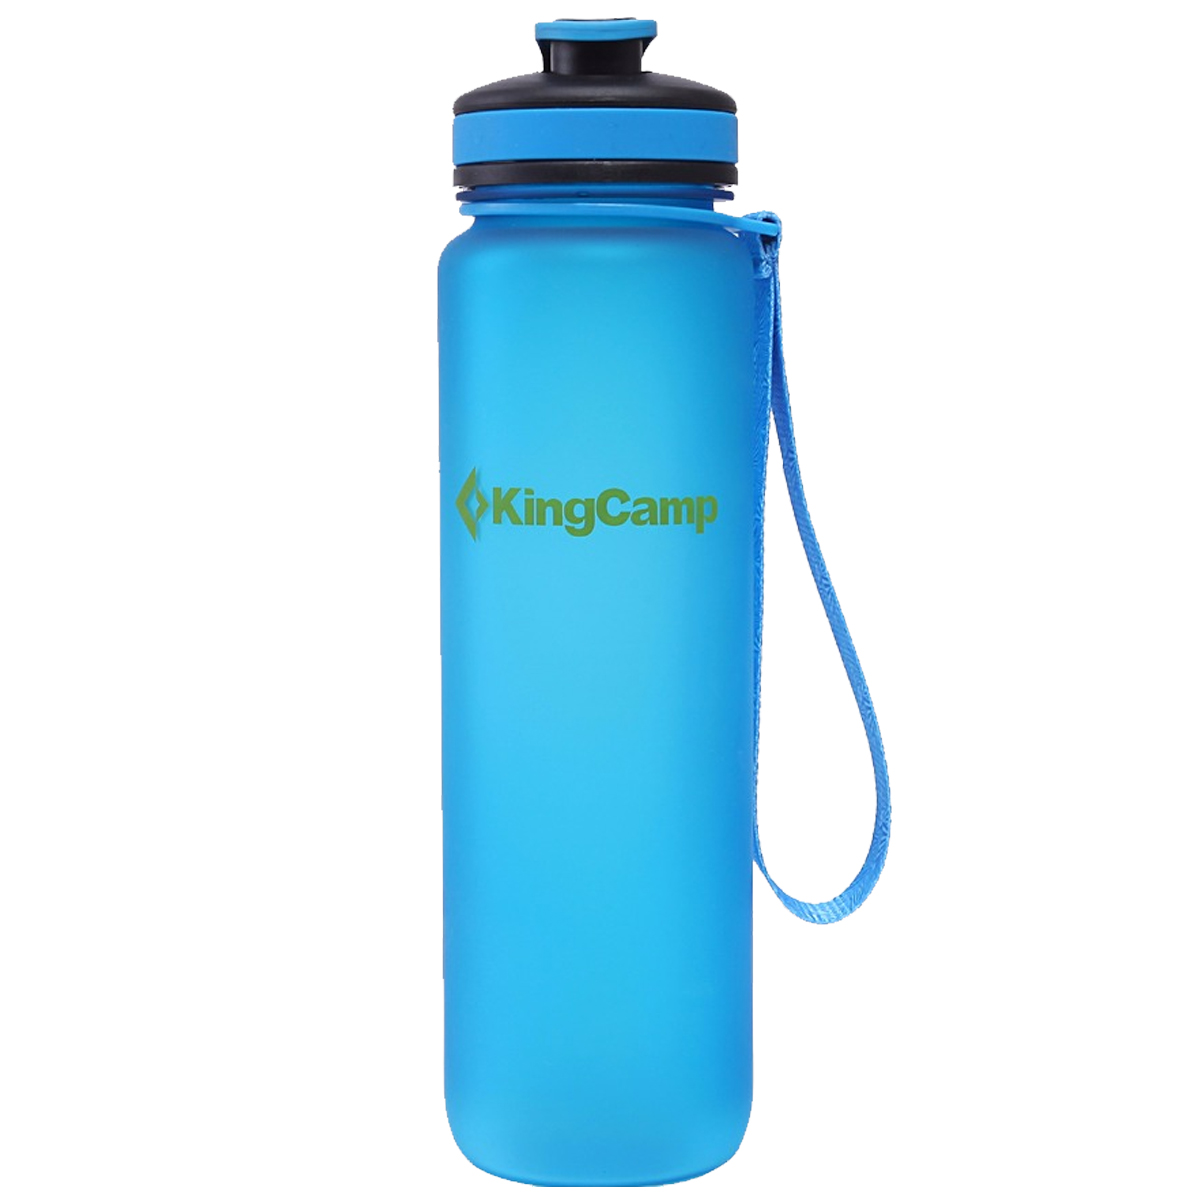 KingCamp 1000ML TRITAN Botella de Agua Boca Ancha Anti Fuga Libre BPA Tap/ón a Prueba de Goteo de 1000 ml de Capacidad Botella de Agua con Cierre para Deportes Ciclismo Camping Gimnasio